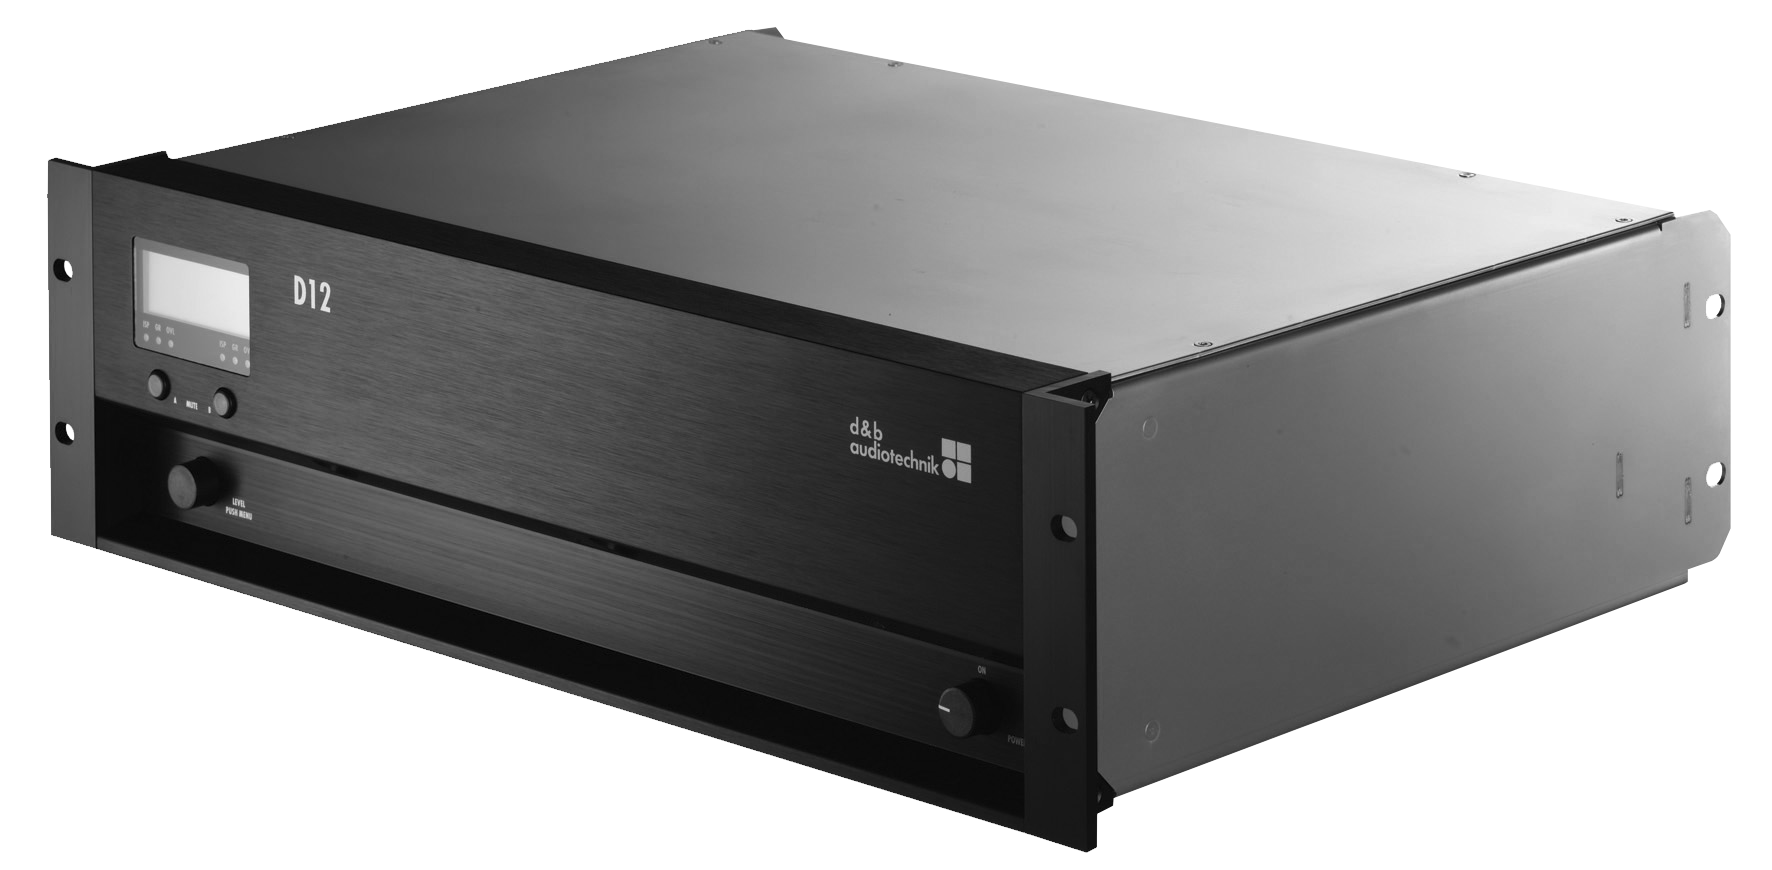 d12 power amplifier by d b audiotechnik for sale apex sound light corporation. Black Bedroom Furniture Sets. Home Design Ideas